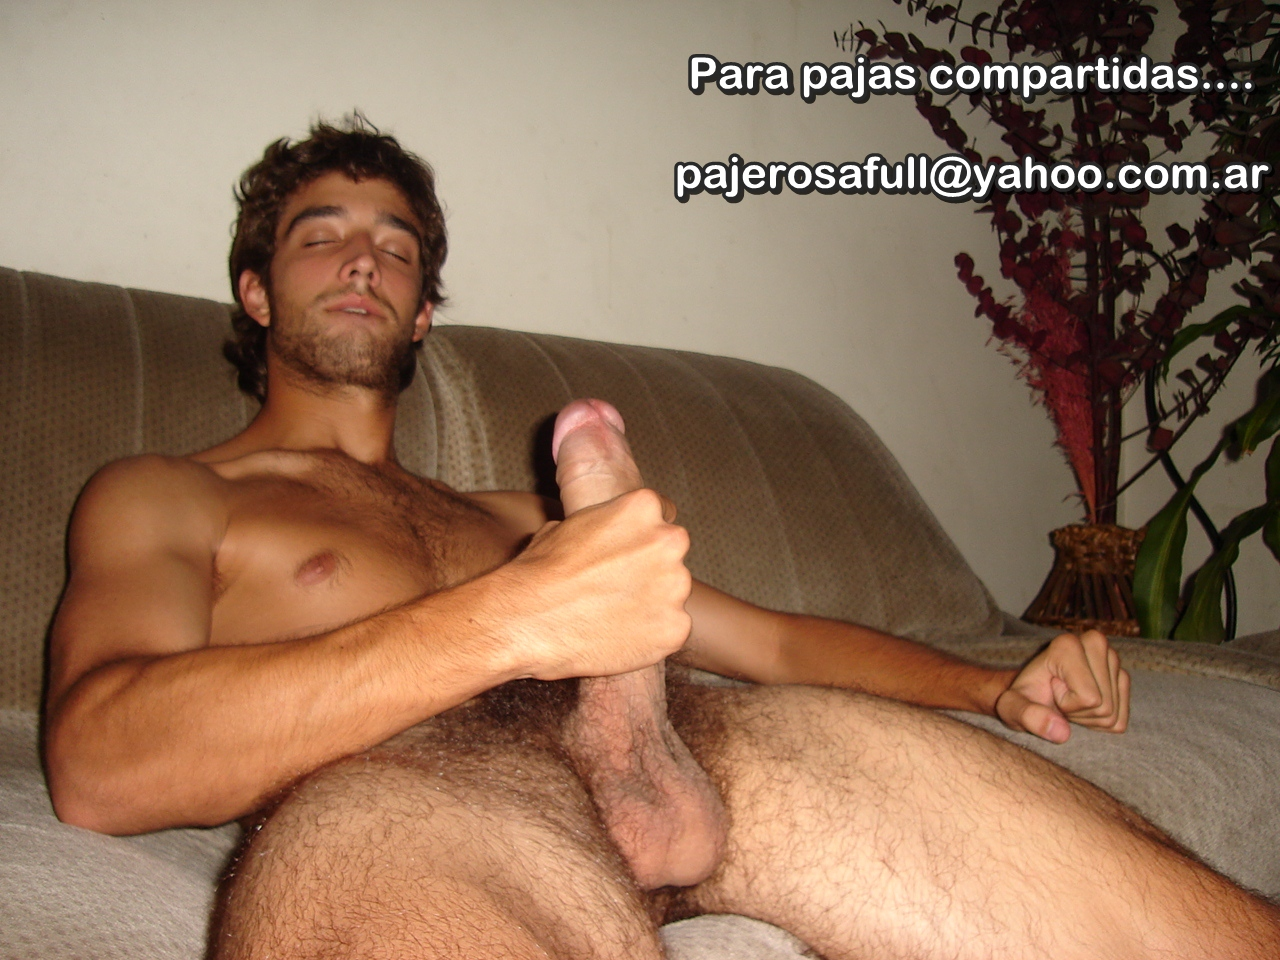 PAJEROS GAY